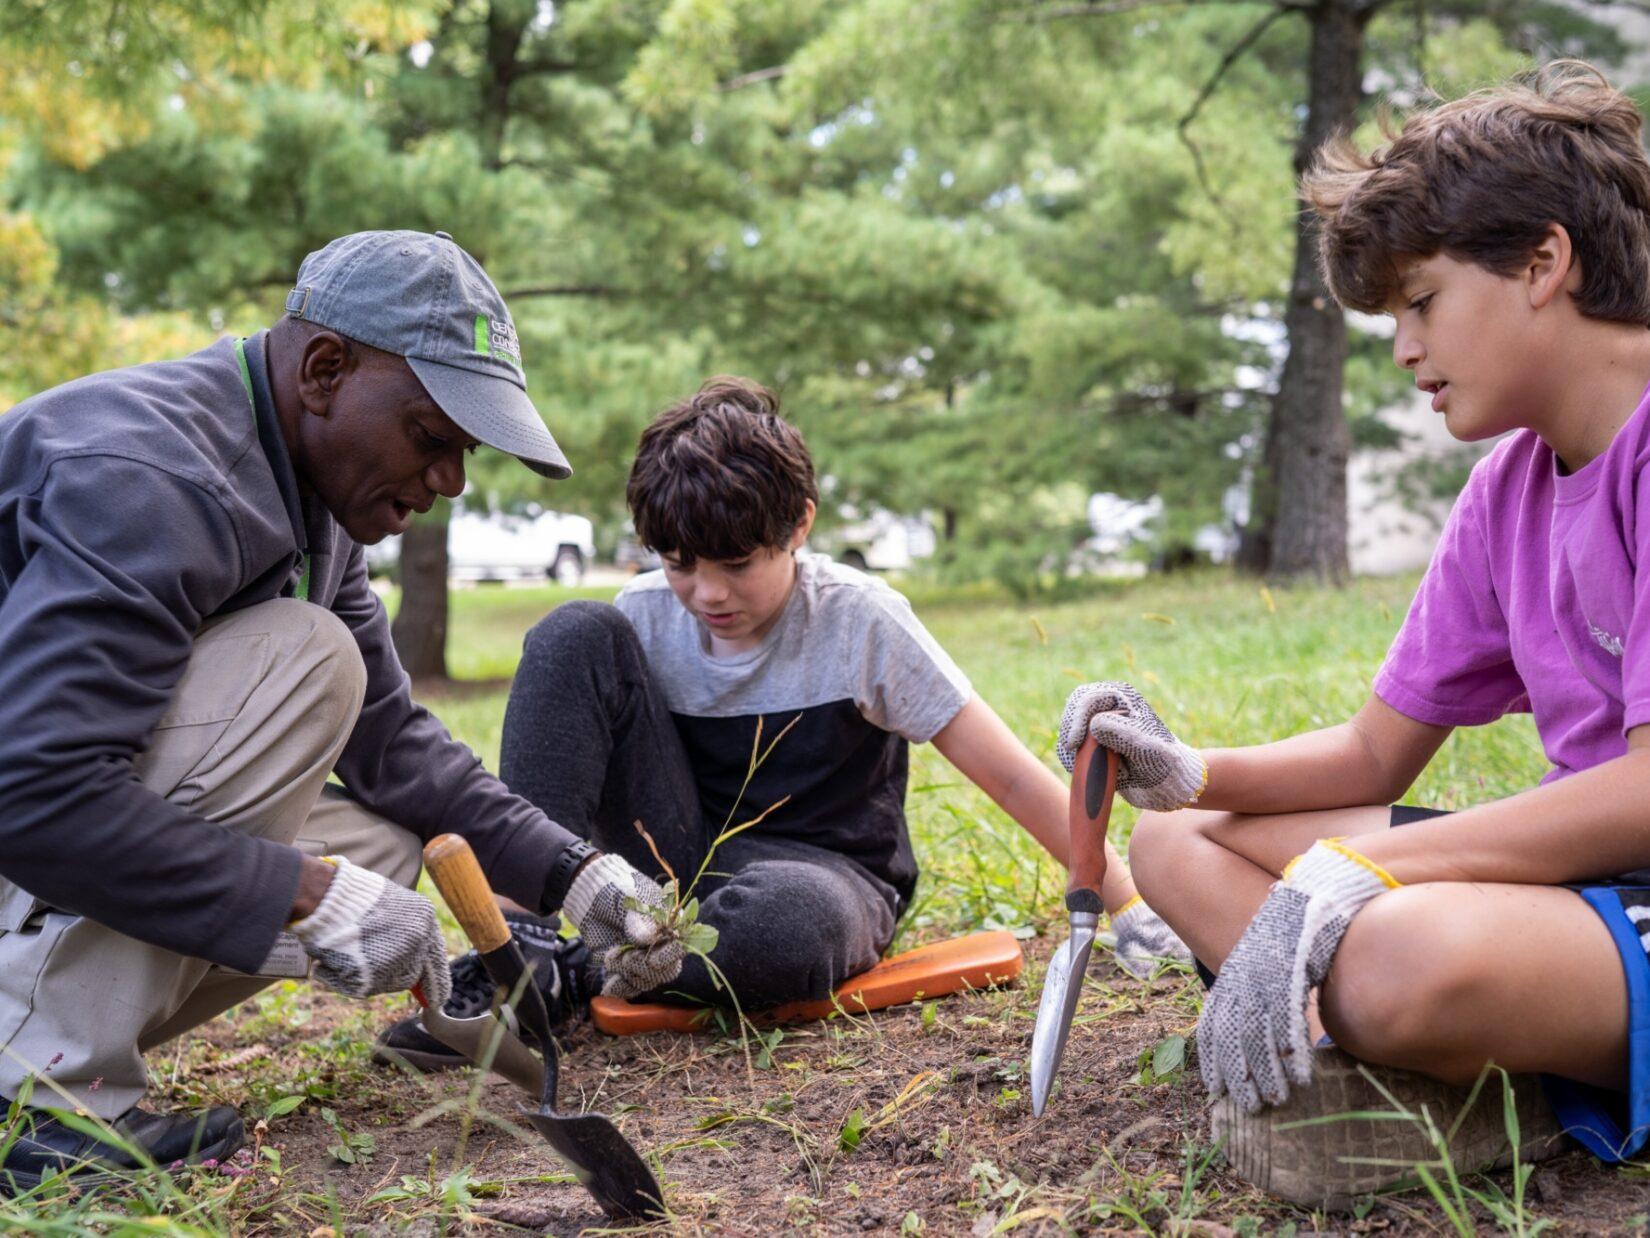 Conservancy staff member William Quansah working with some school group volunteers